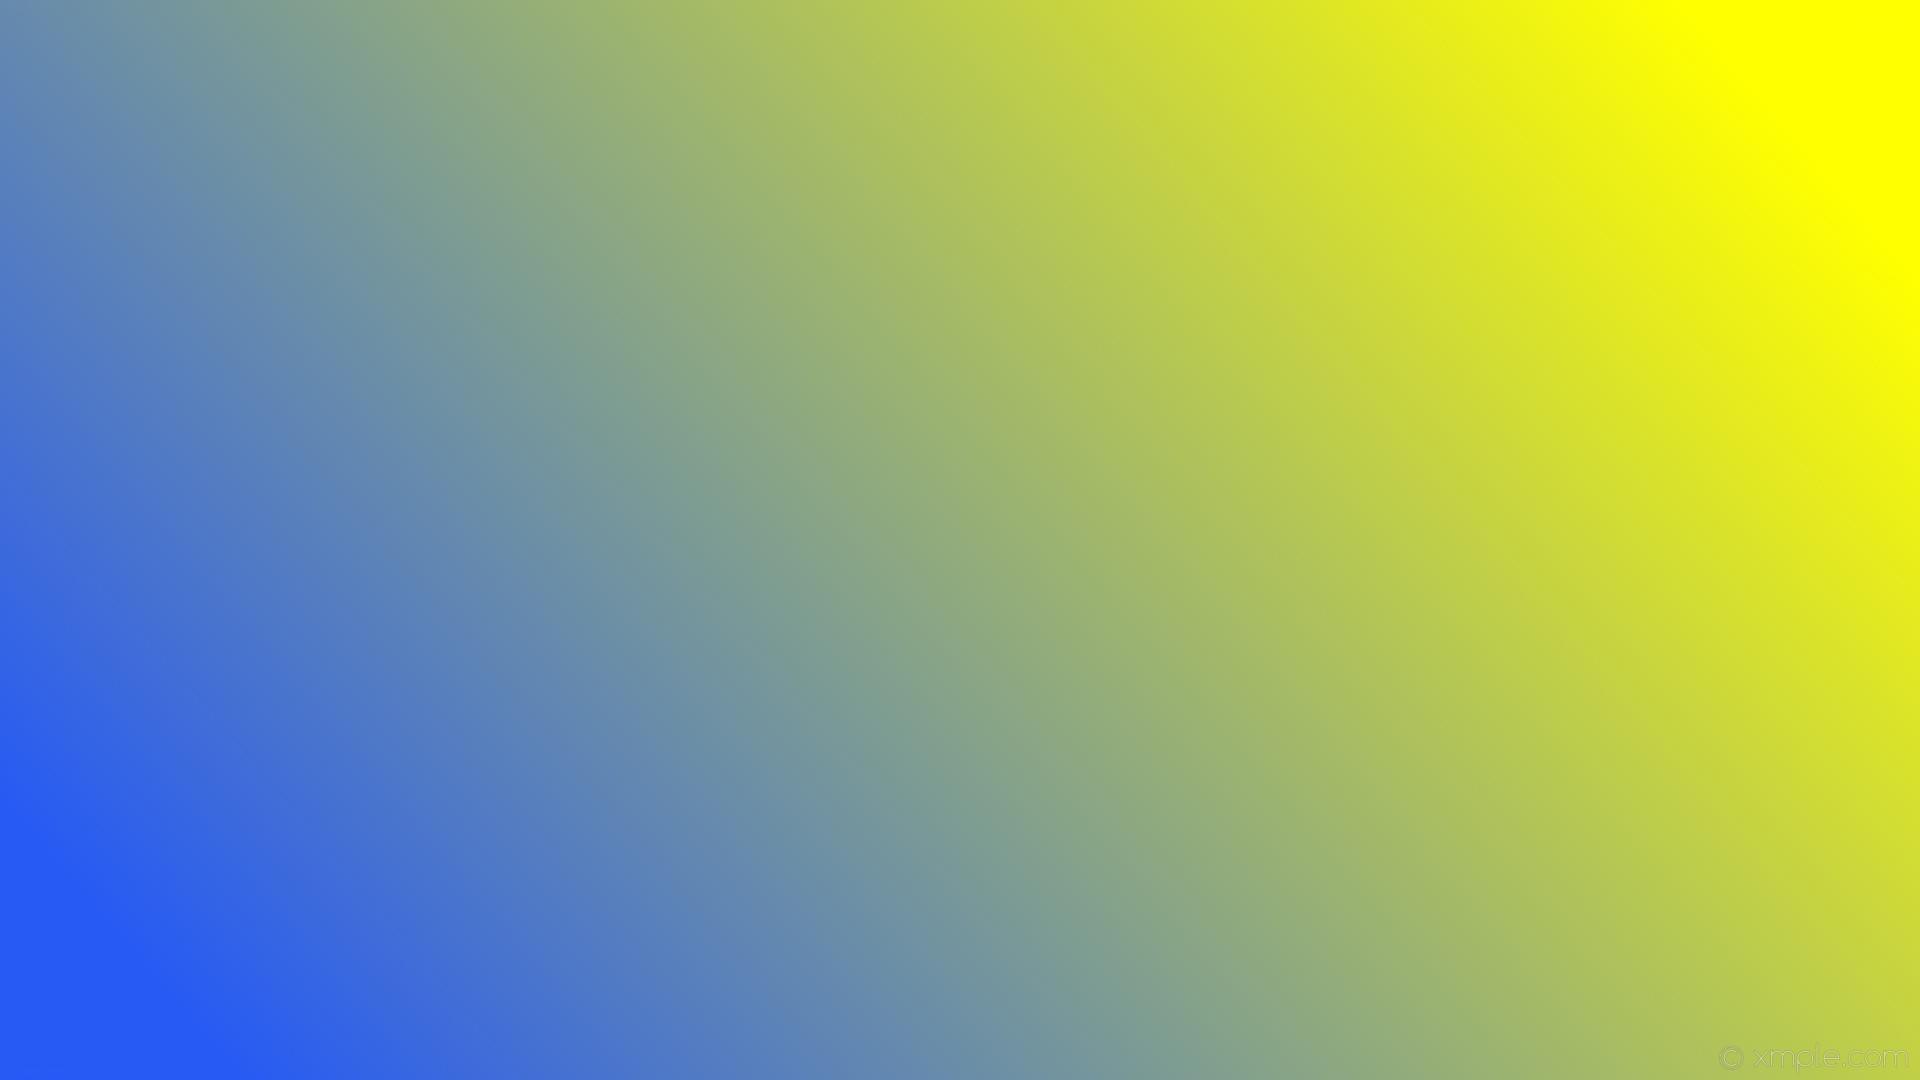 wallpaper linear gradient blue yellow #275af4 #ffff00 195°